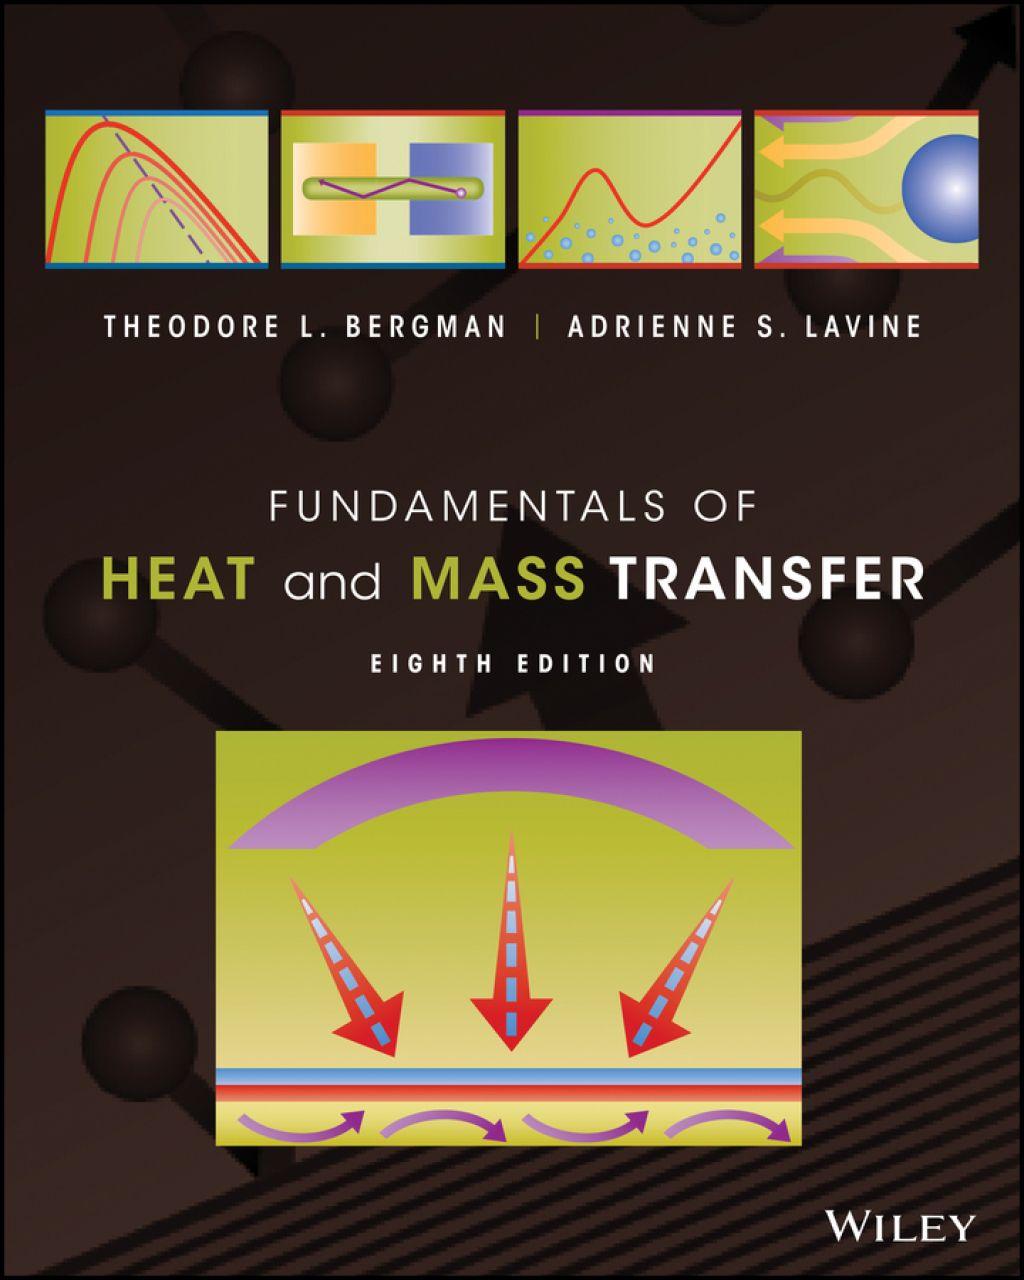 Fundamentals Of Heat And Mass Transfer Enhanced Etext Ebook Rental Wishes For Teacher Fundamental Science Textbook